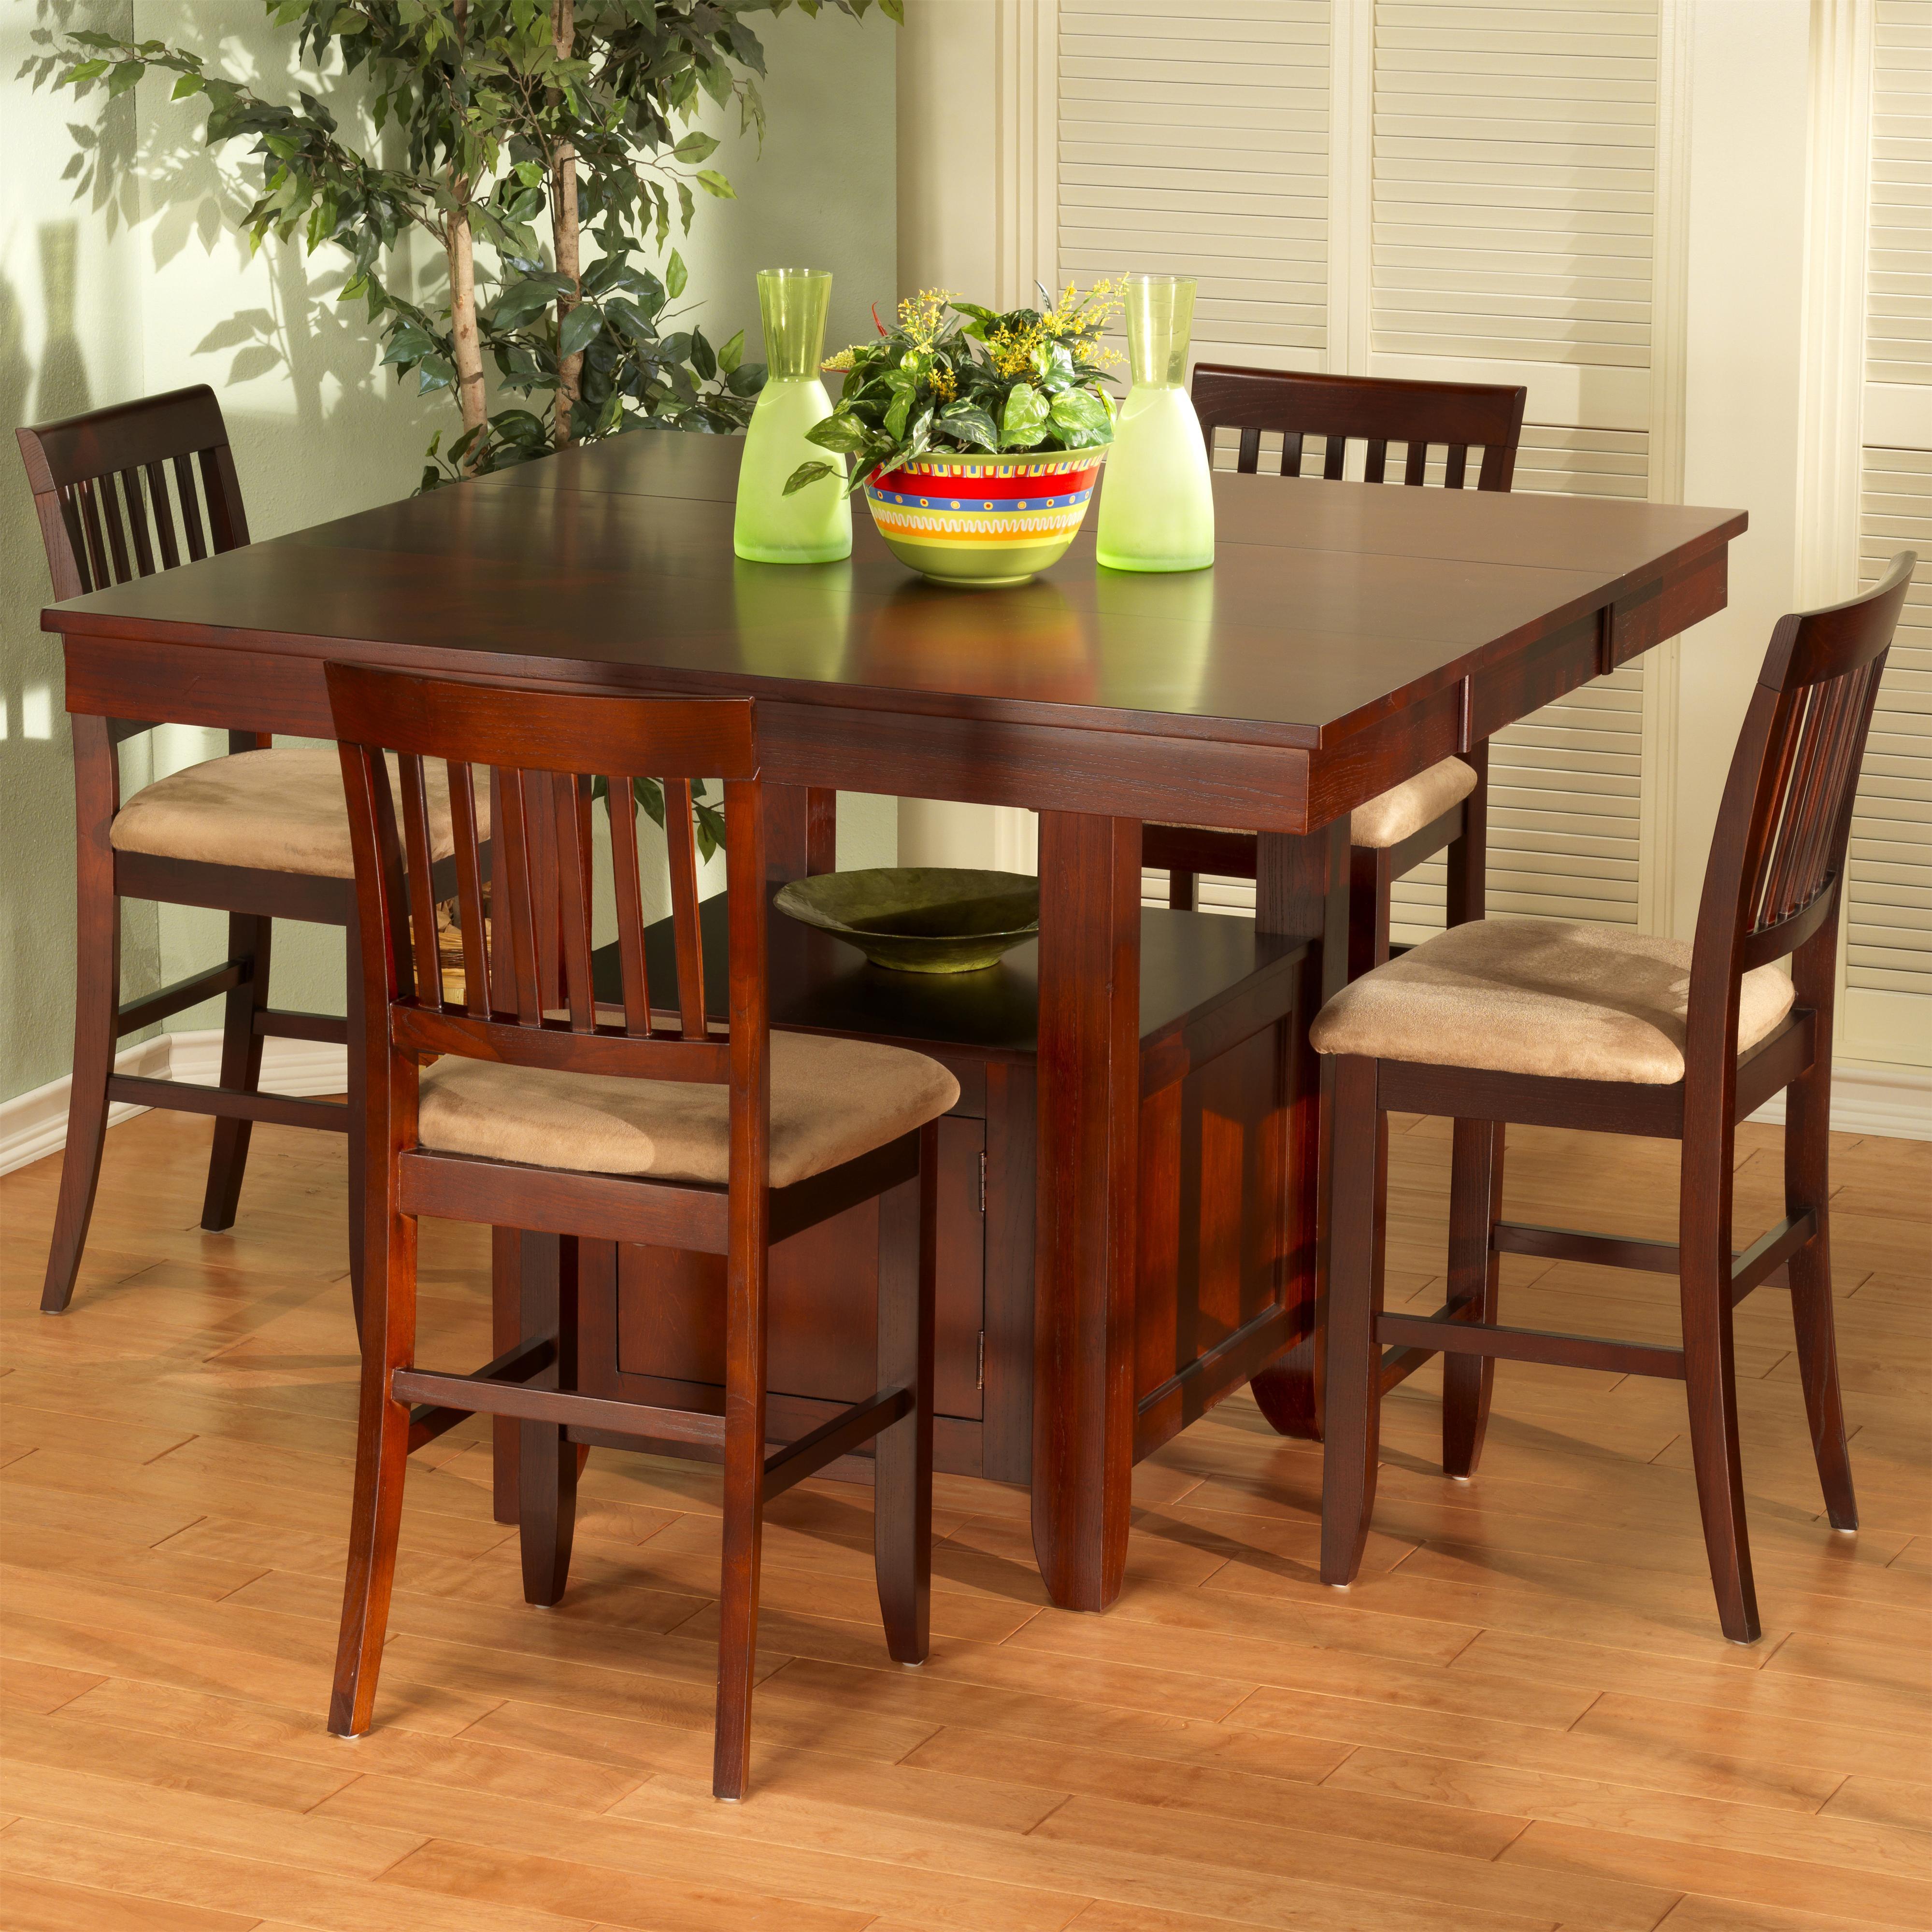 new classic brendan 5 piece storage pub table and counter chair set rh boulevardhomefurnishings com